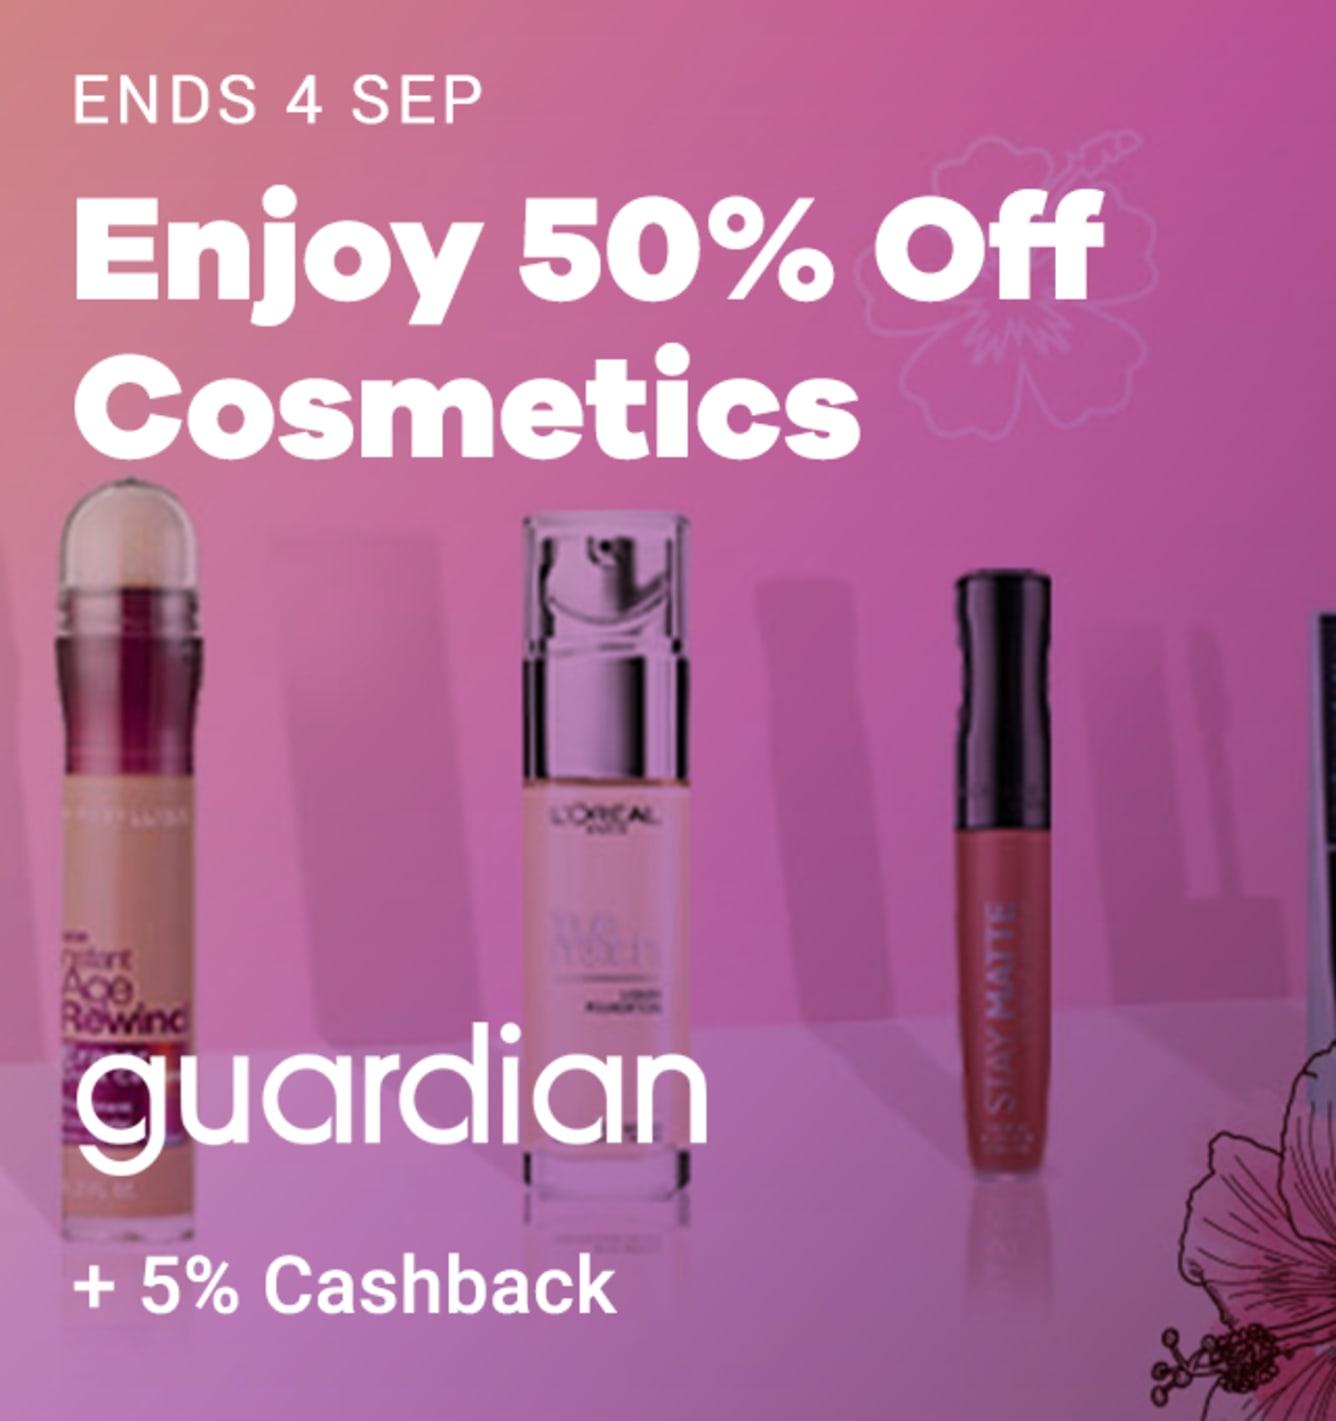 Guardian: 5% Cashback